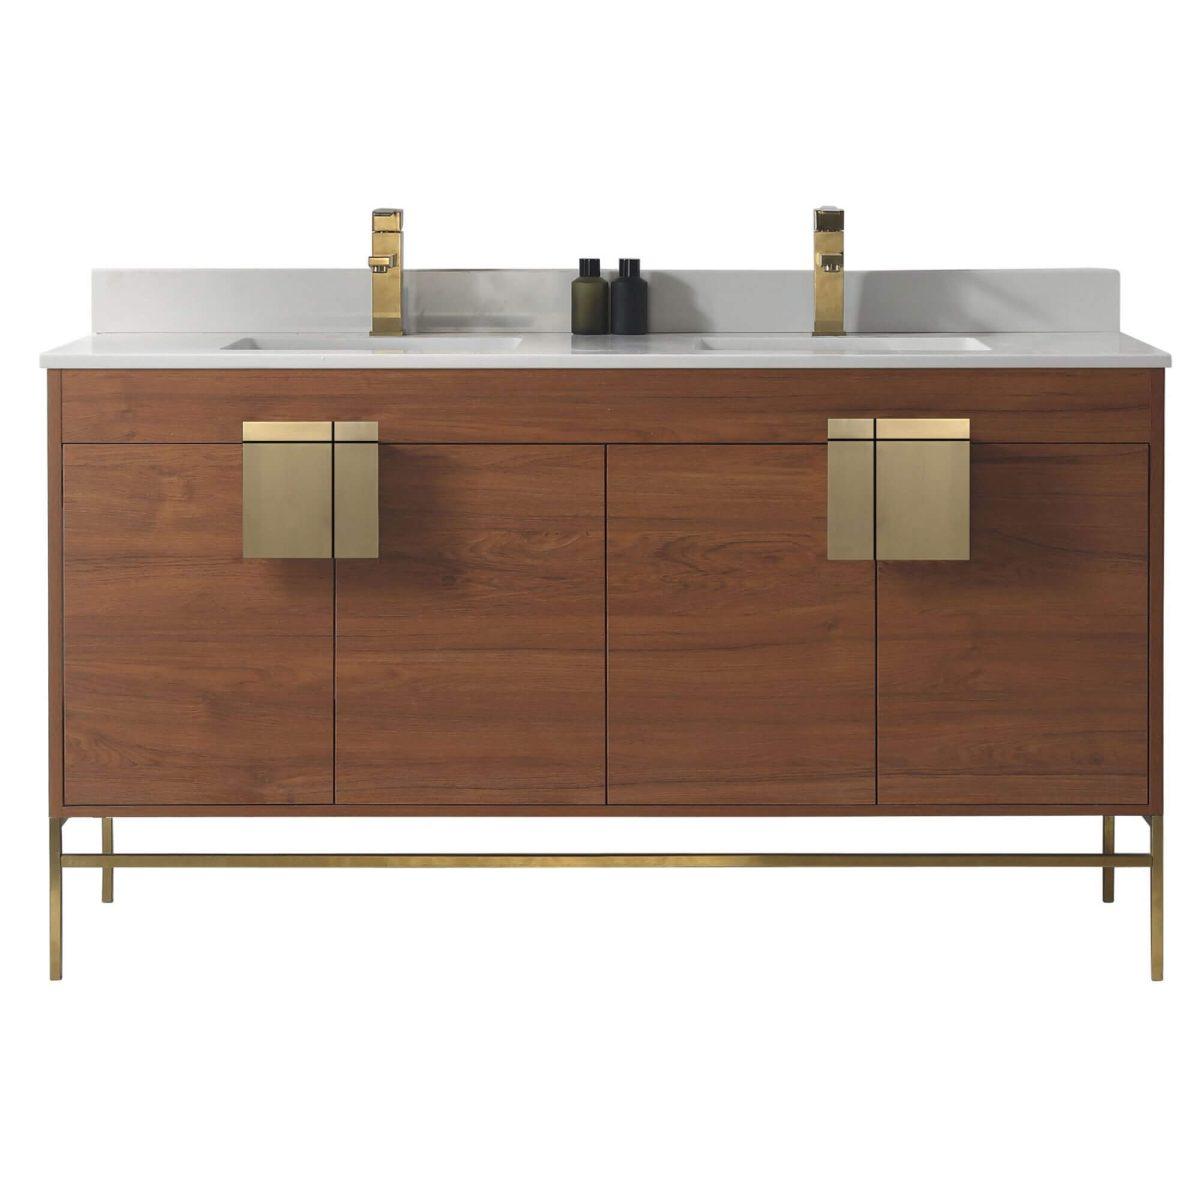 "Shawbridge 60"" Modern Double Bathroom Vanity  Spicy Walnut with Satin Brass Hardware"